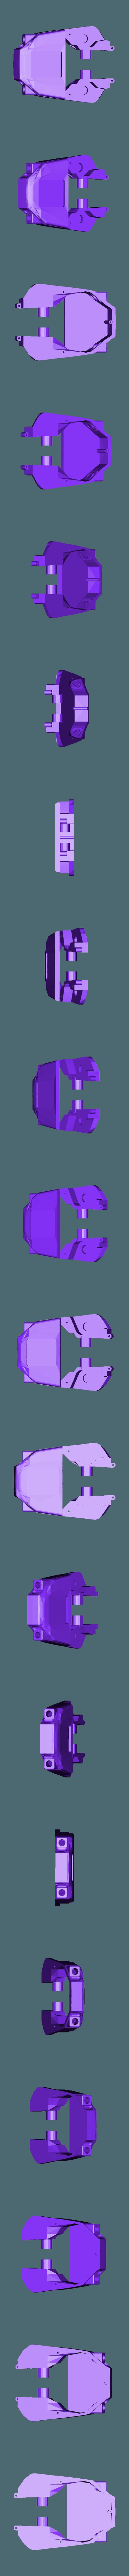 head_botom.stl Download free STL file Foldable drone frame (Mavic look like, body & head alternative) Remix • 3D printer model, mwilmars